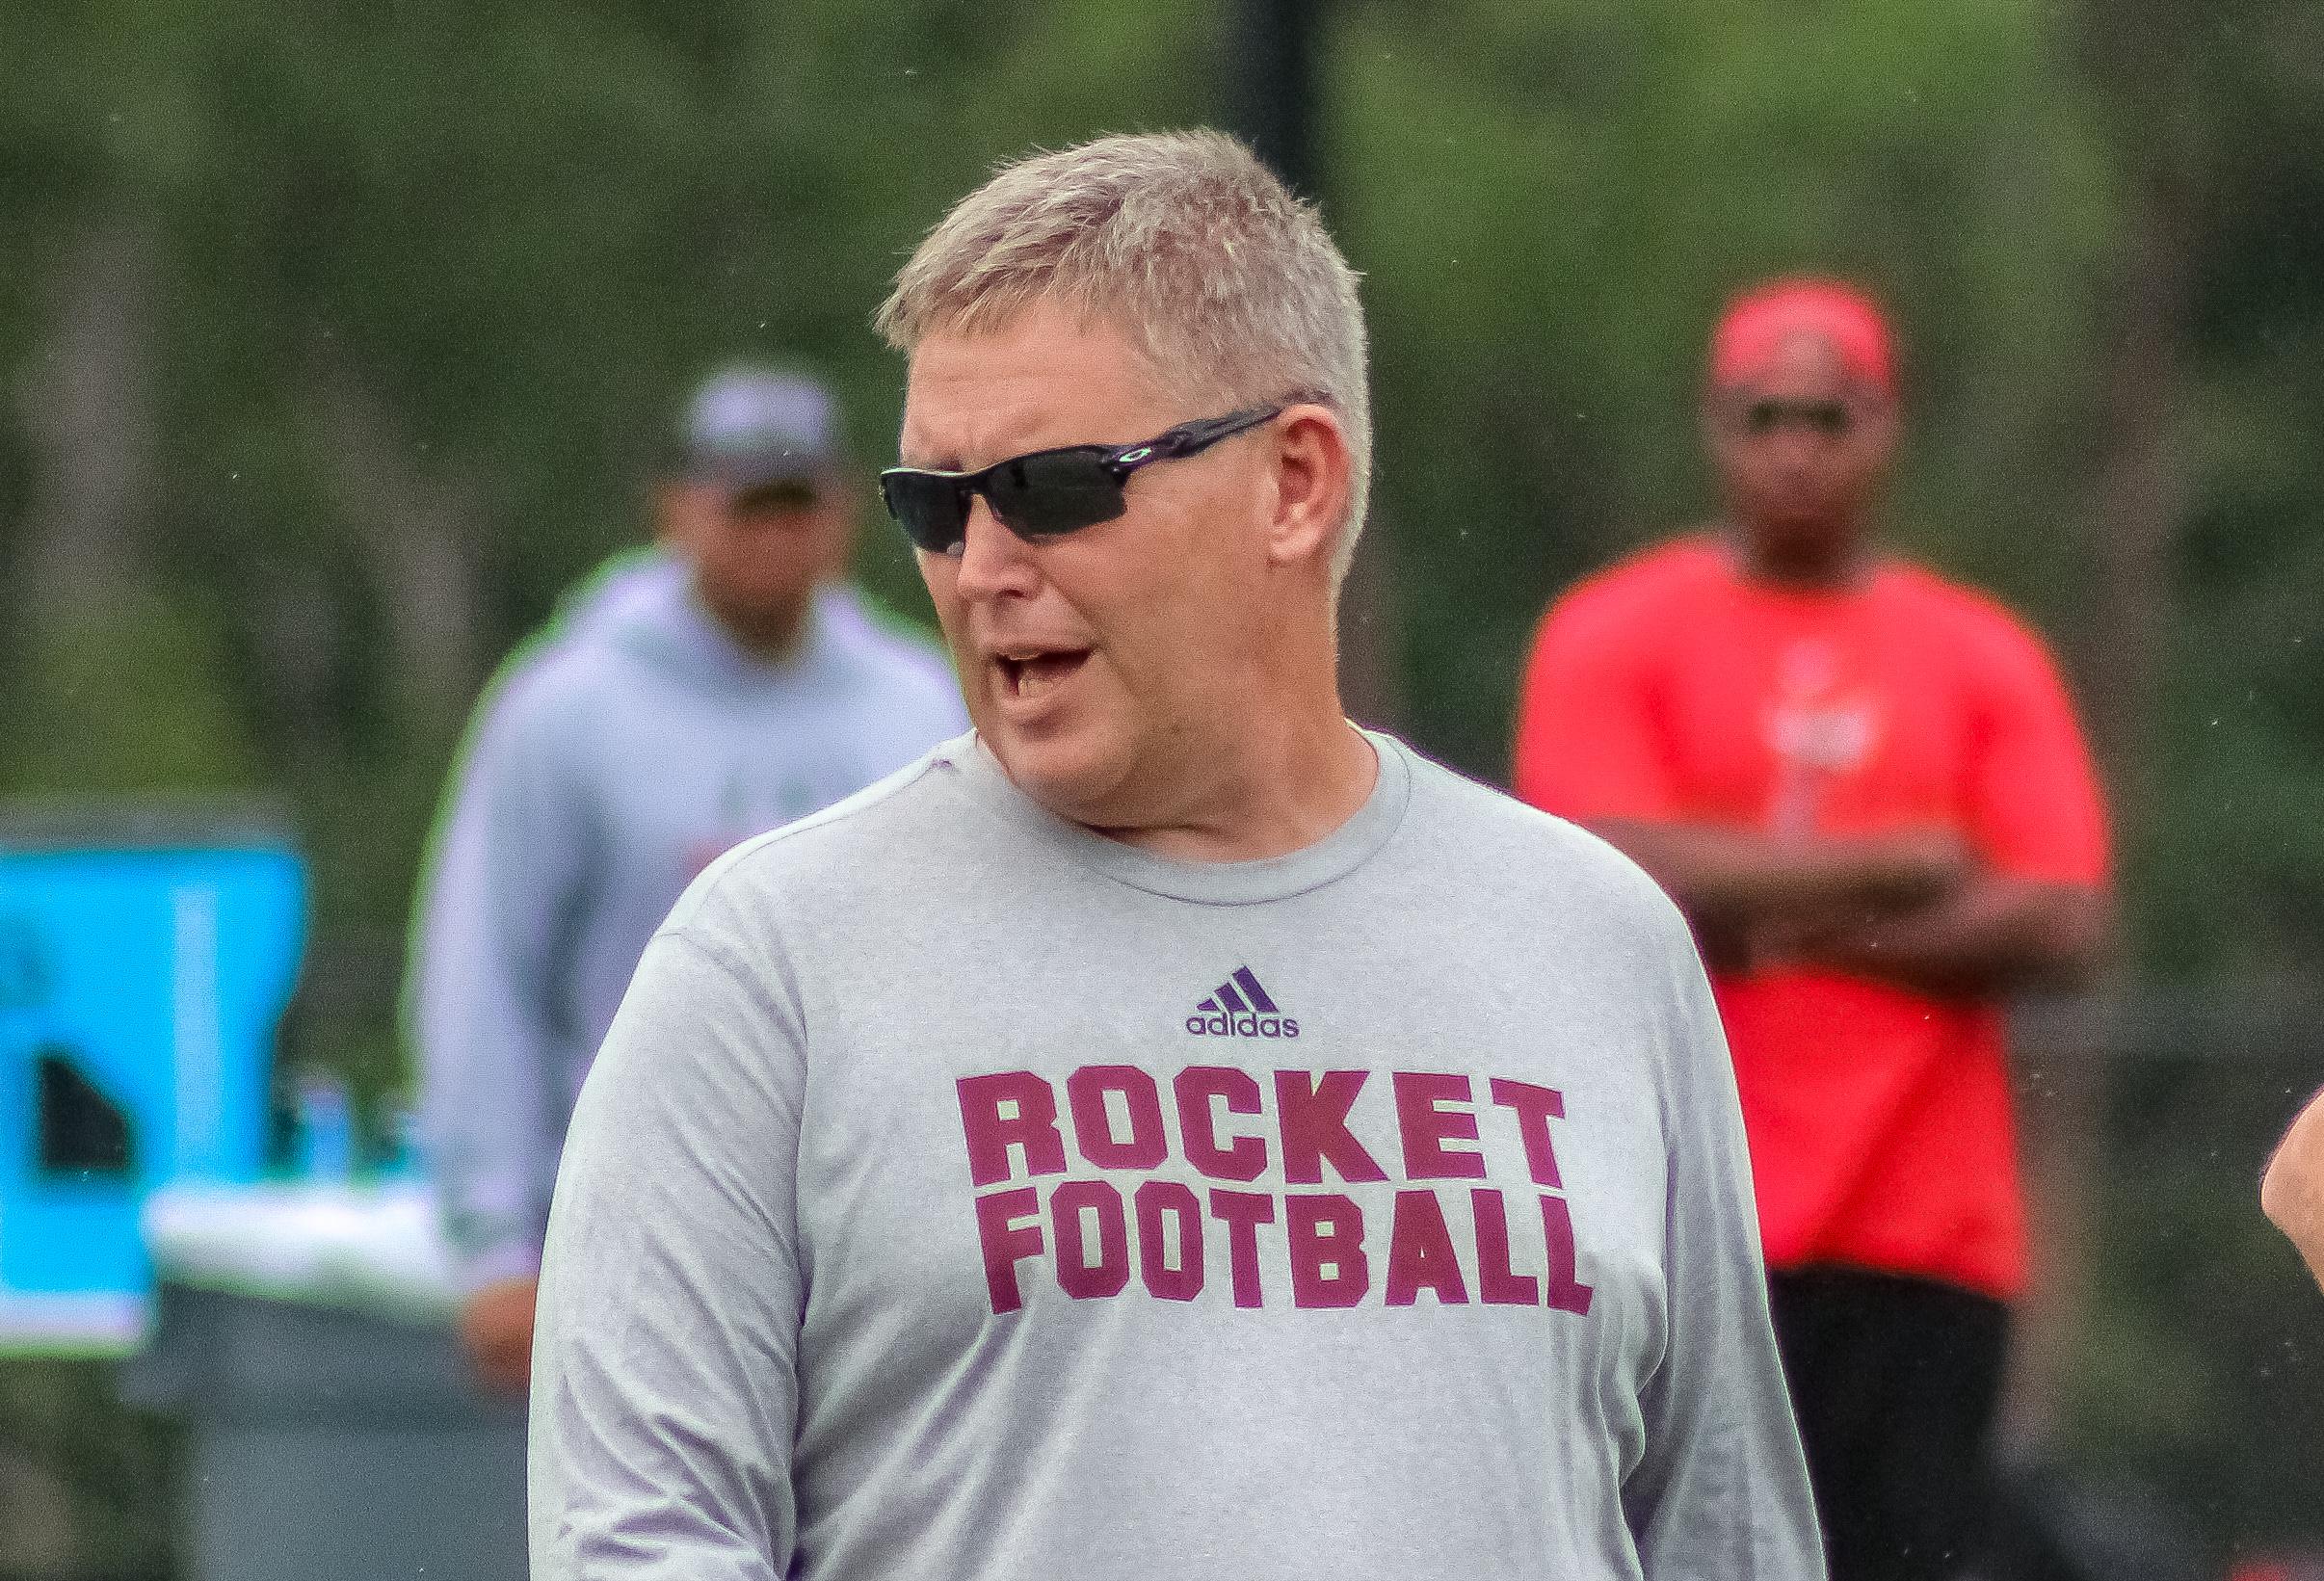 Gardendale High School head football coach Chad Eads